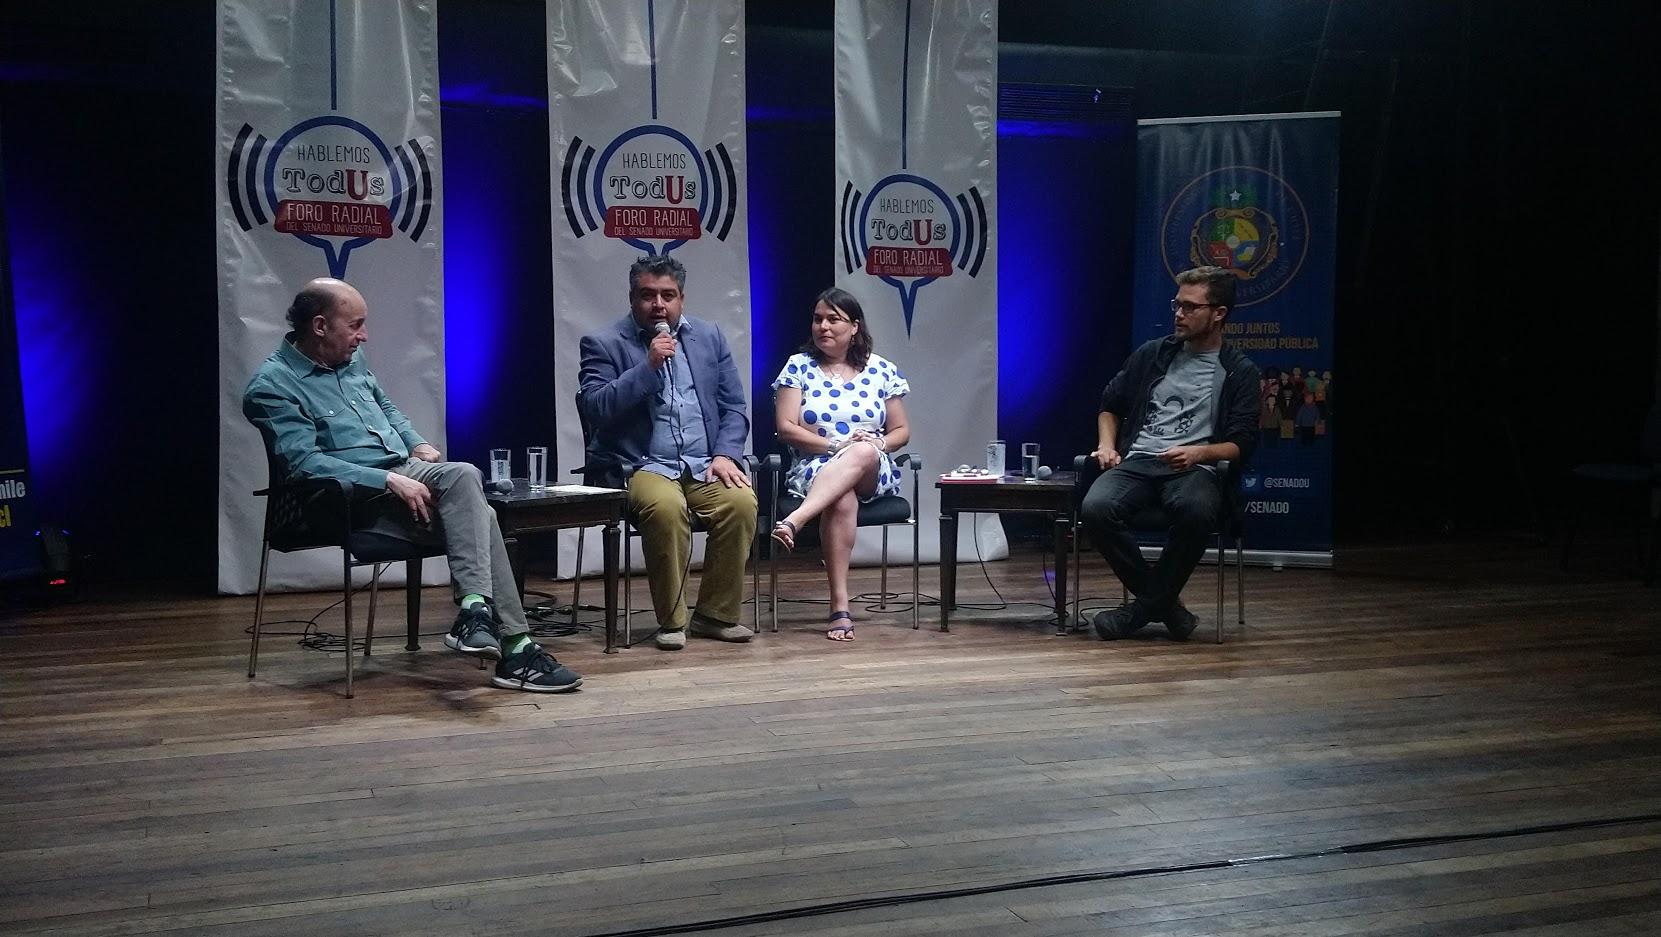 Foro Radio Uchile - Panelistas